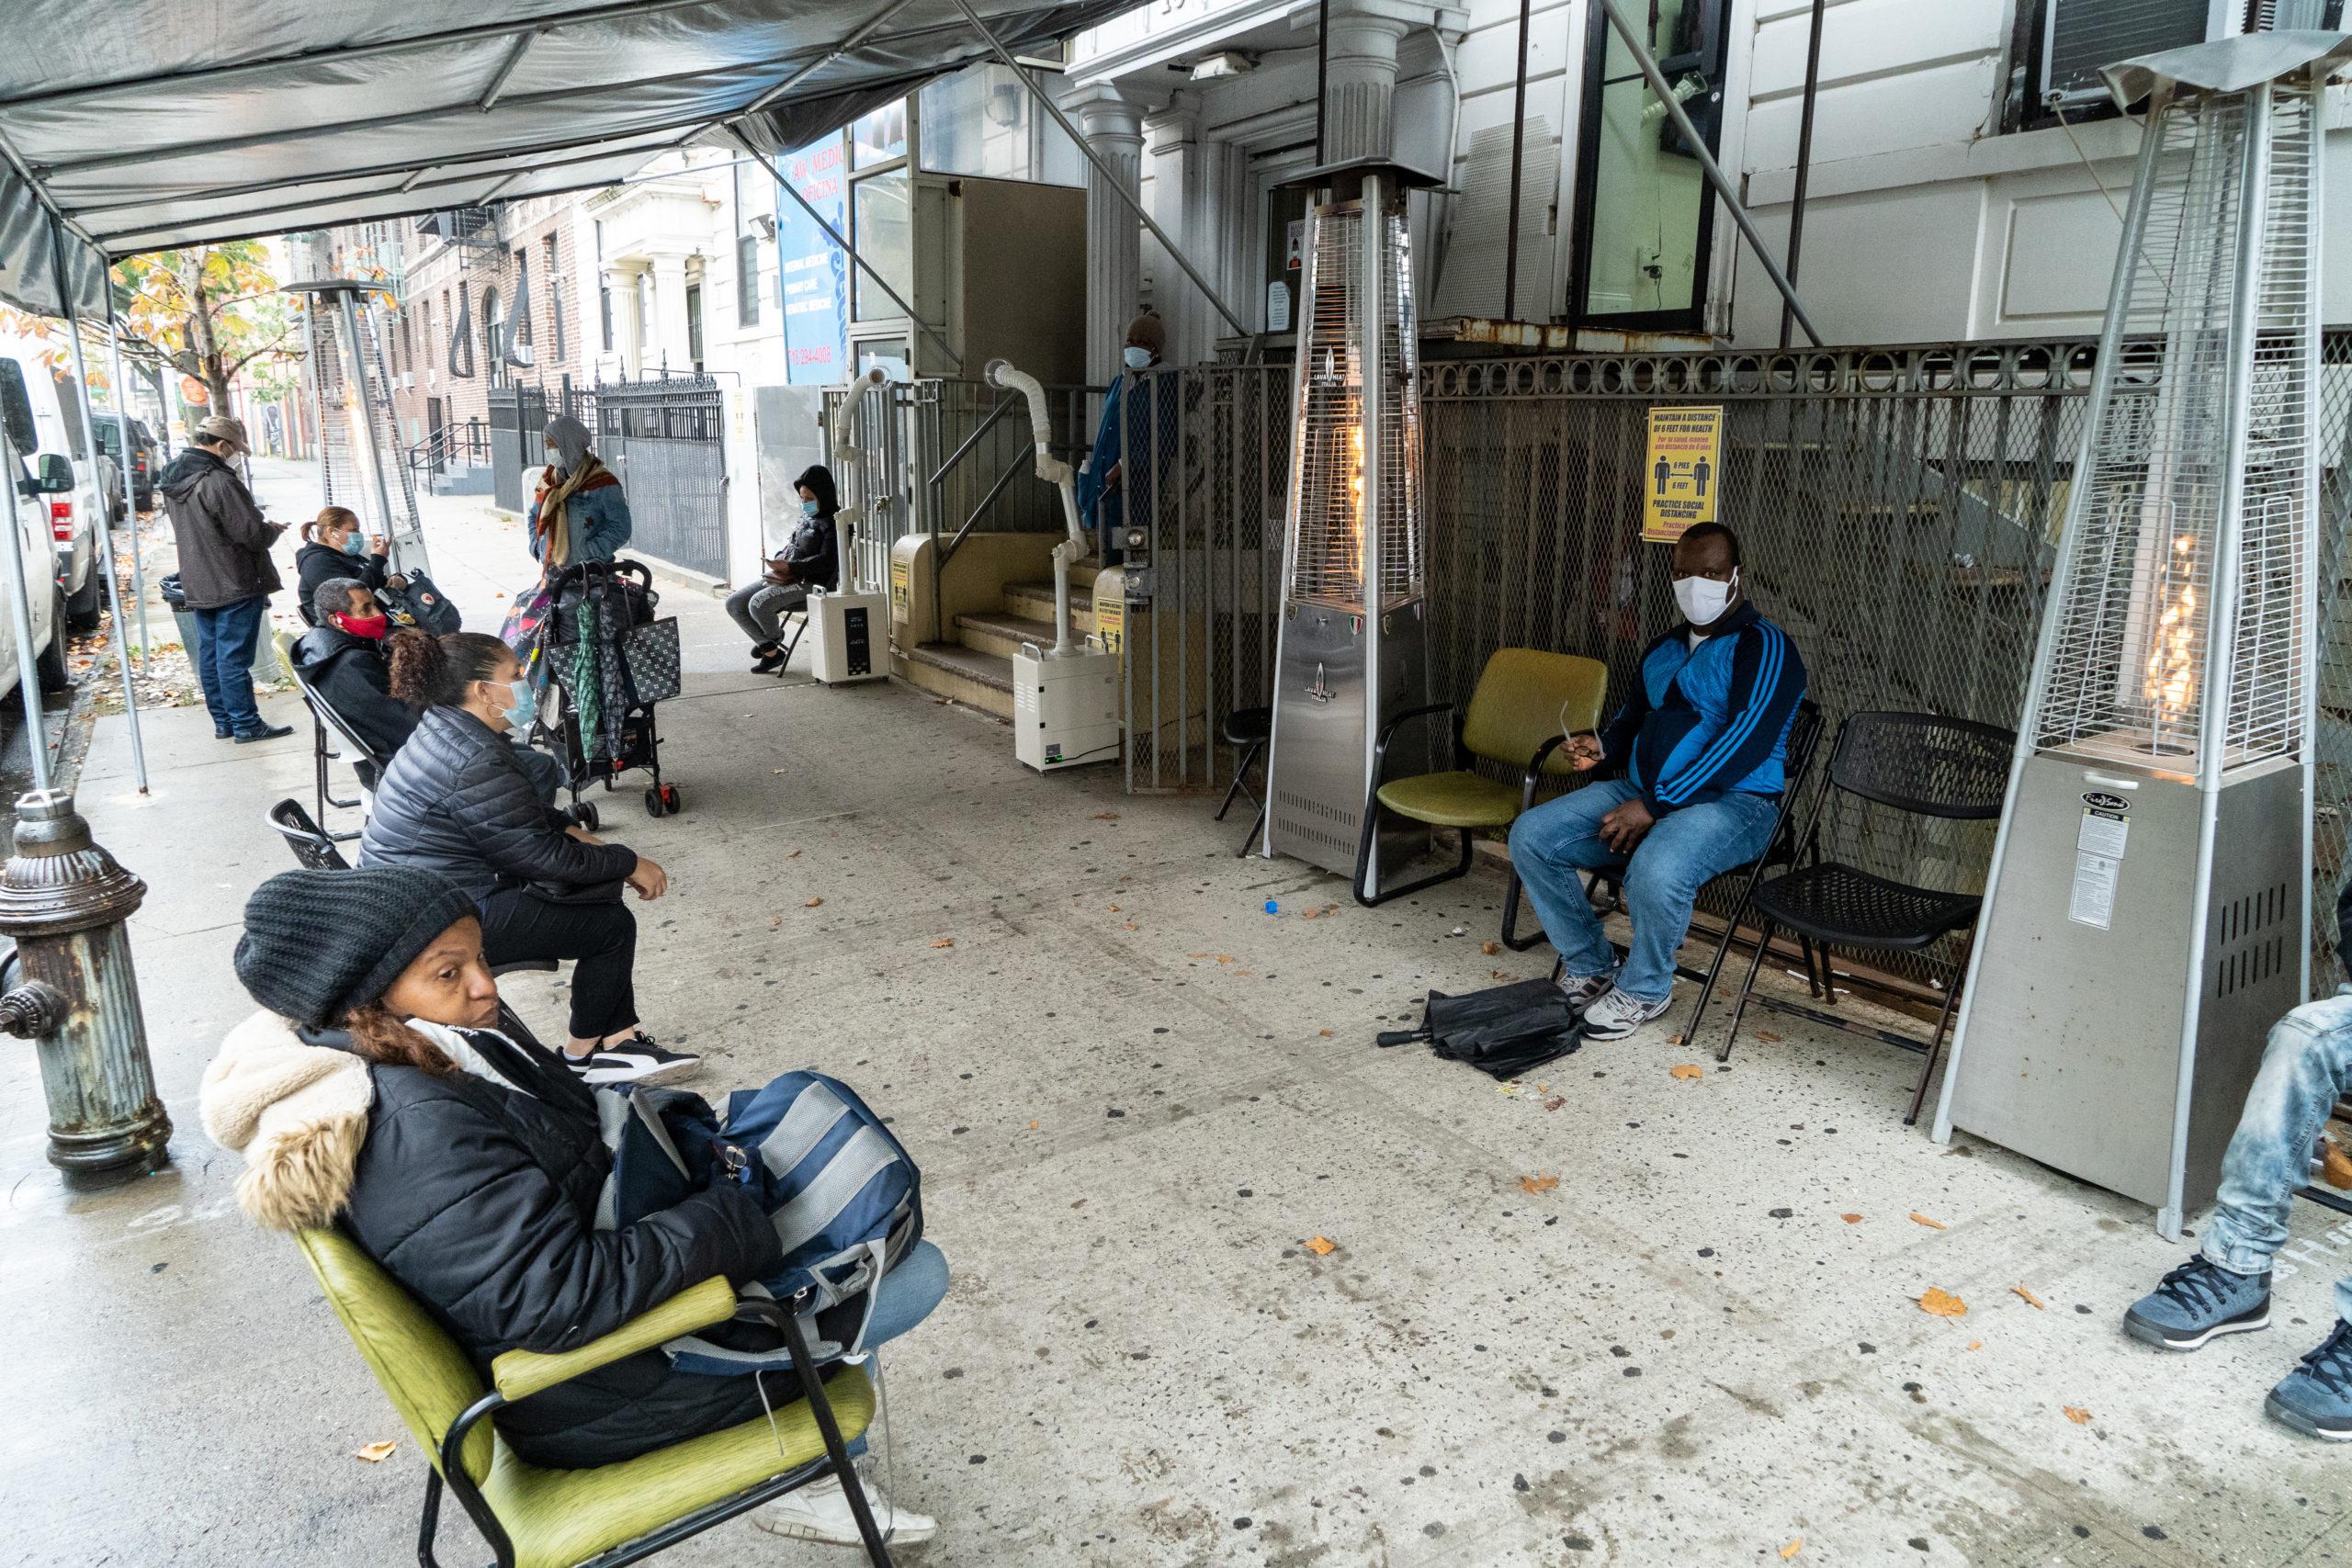 October 26, 2020: Improvised outdoor waiting room, medical offices at 1624 University Avenue/Dr. Martin Luther King Jr. Boulevard, Bronx, New York. © Camilo José Vergara